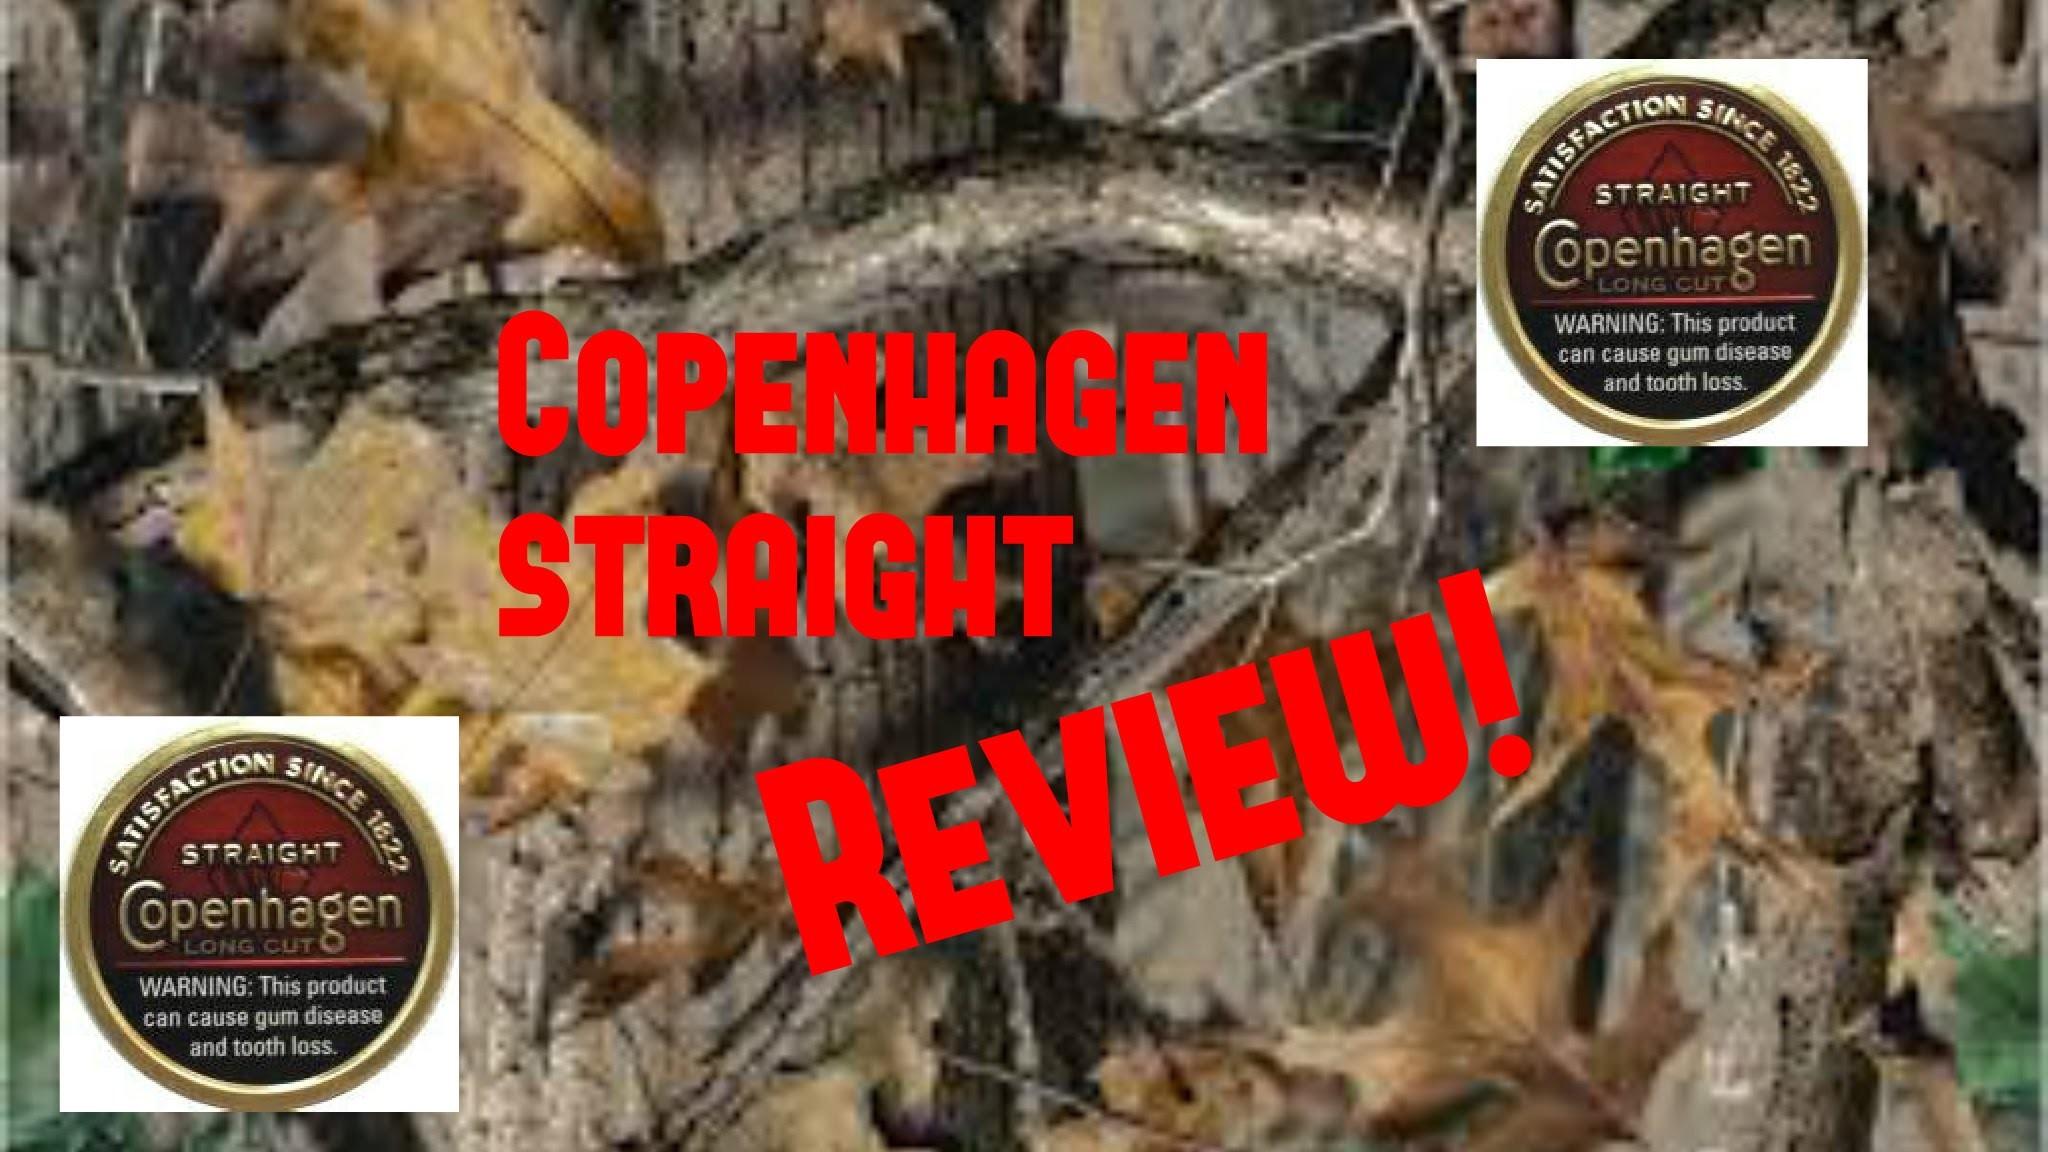 Copenhagen straight review!